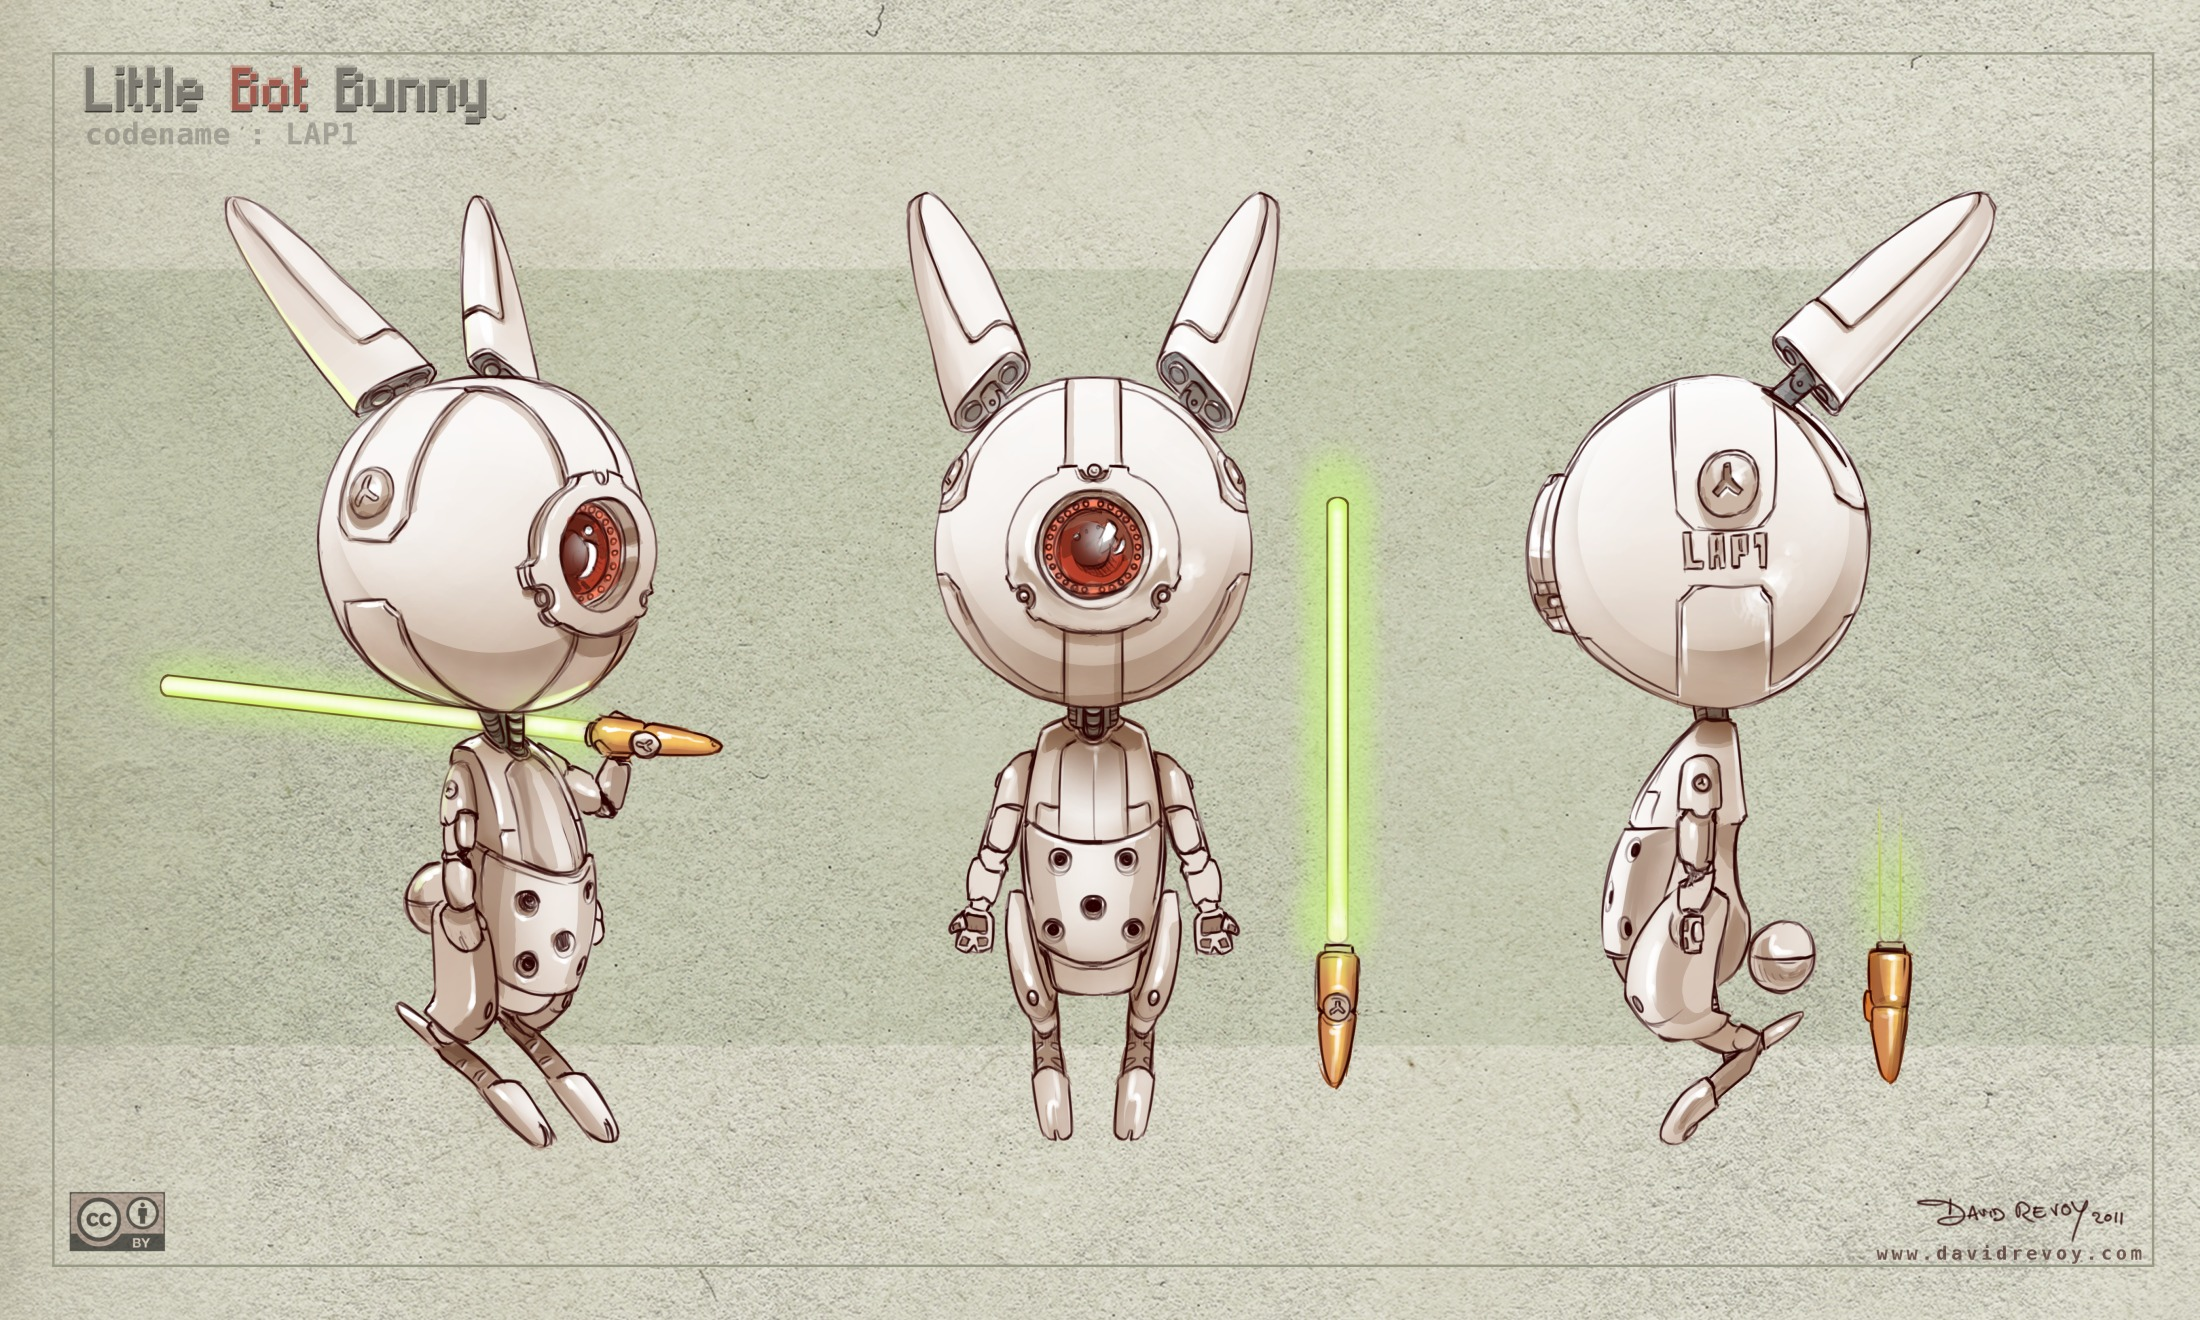 3d Game Character Design Tutorial : Free d model sheet little bot bunny david revoy